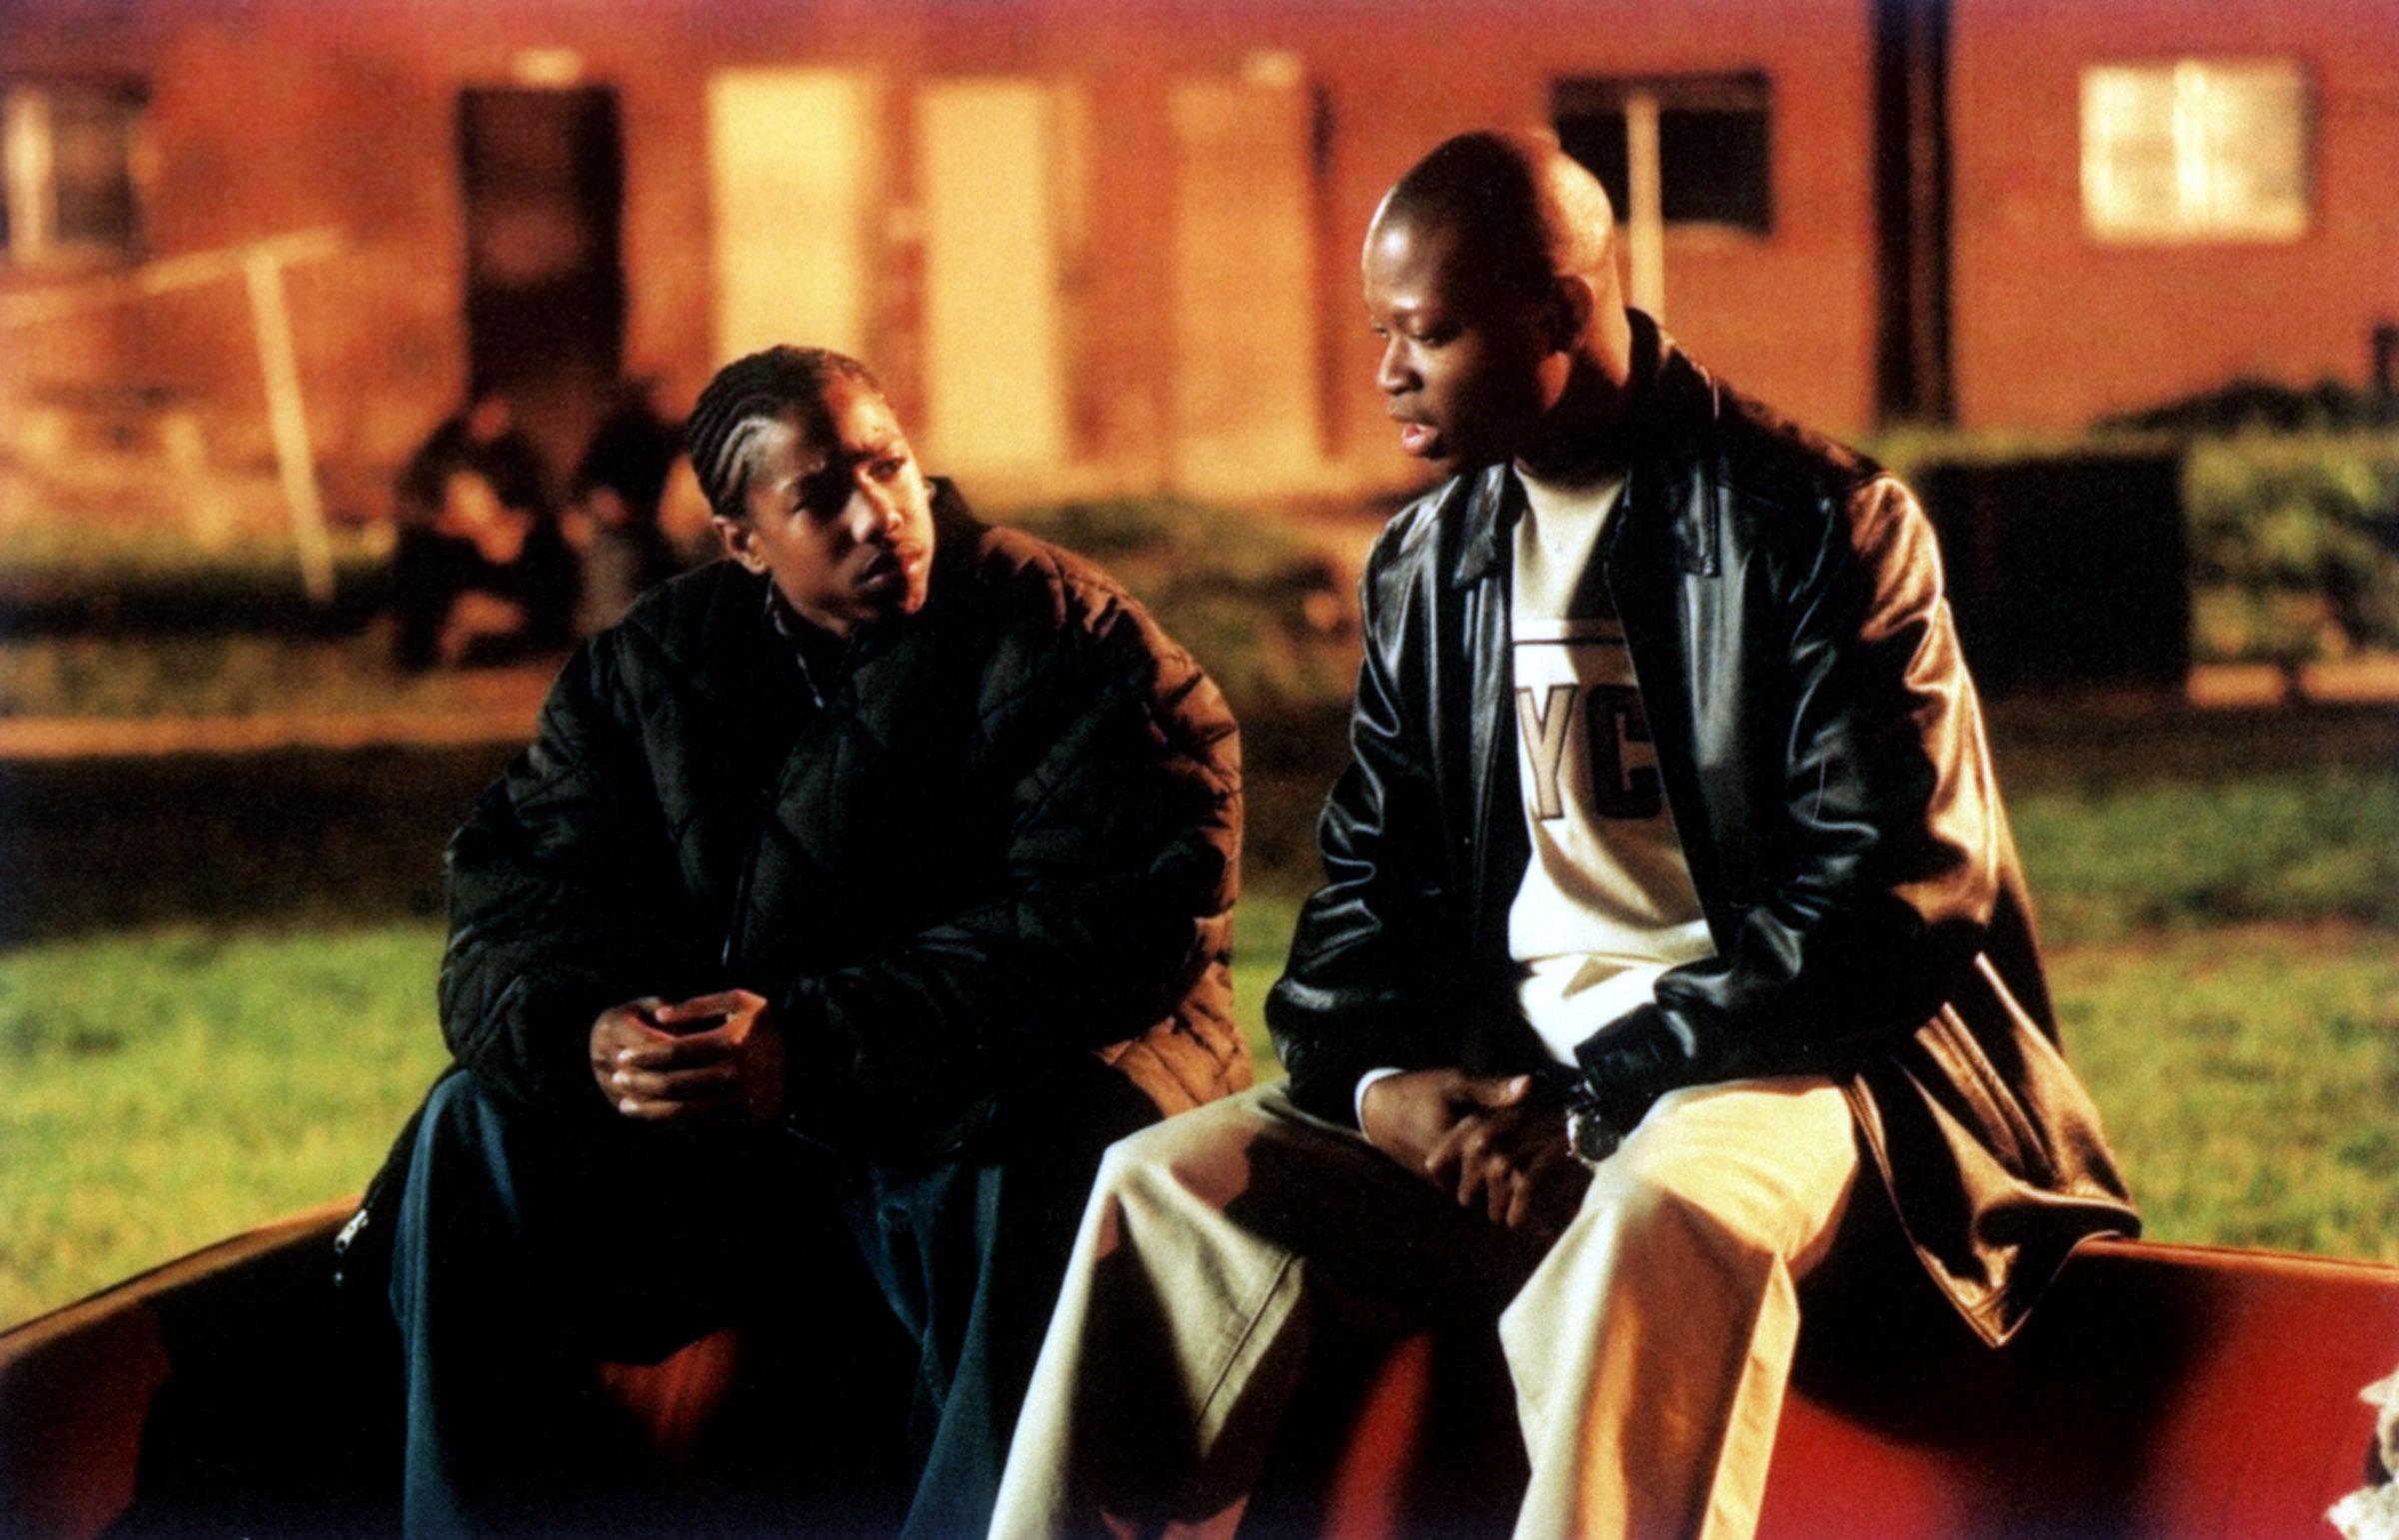 THE WIRE, Larry Gilliard Jr. (right), (Season 1), 2002-08. © HBO / Courtesy: Everett Collection